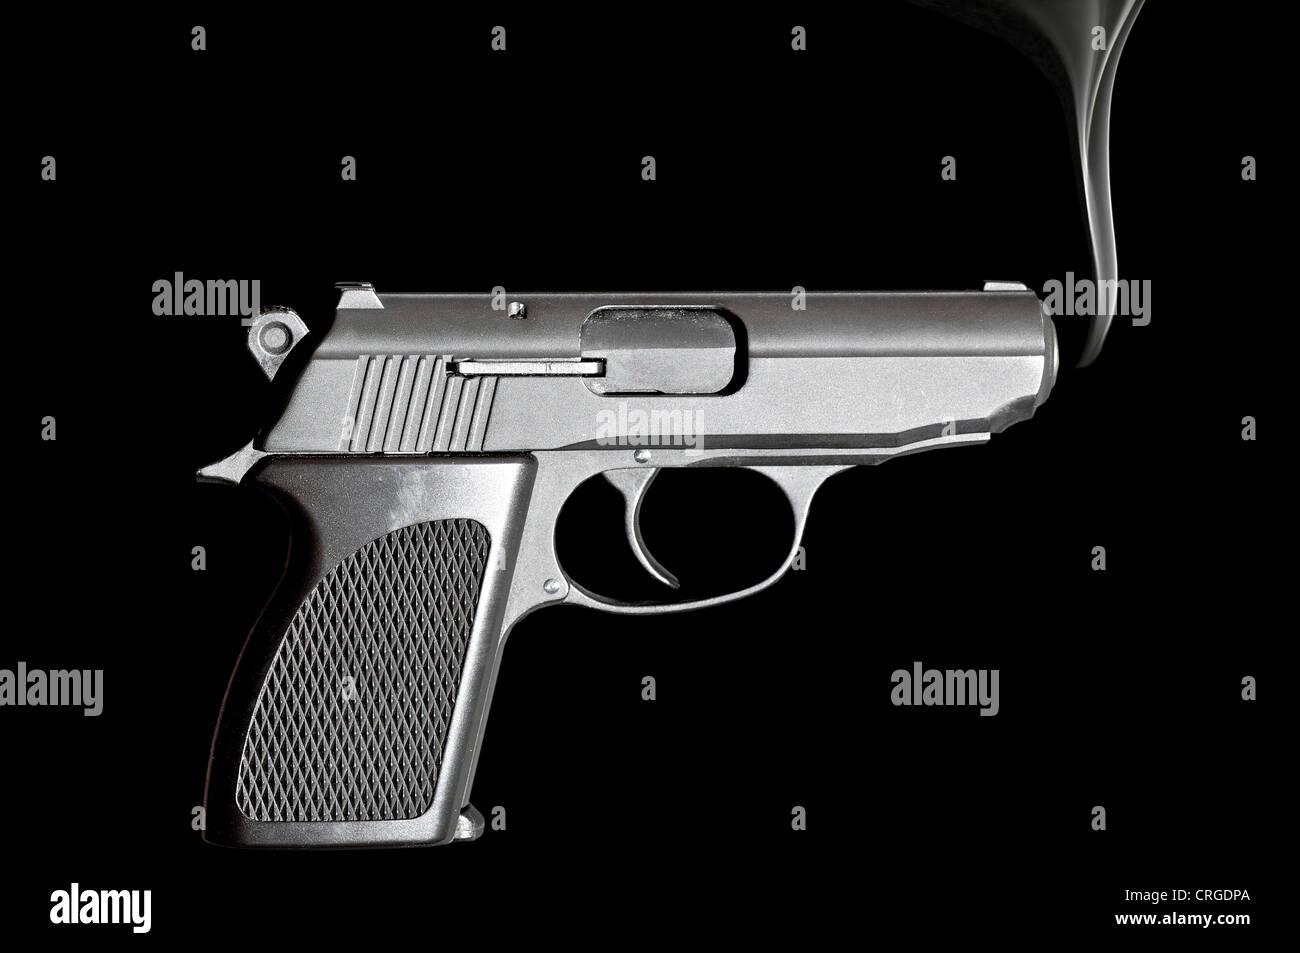 Handgun with smoke emerging from it - Stock Image